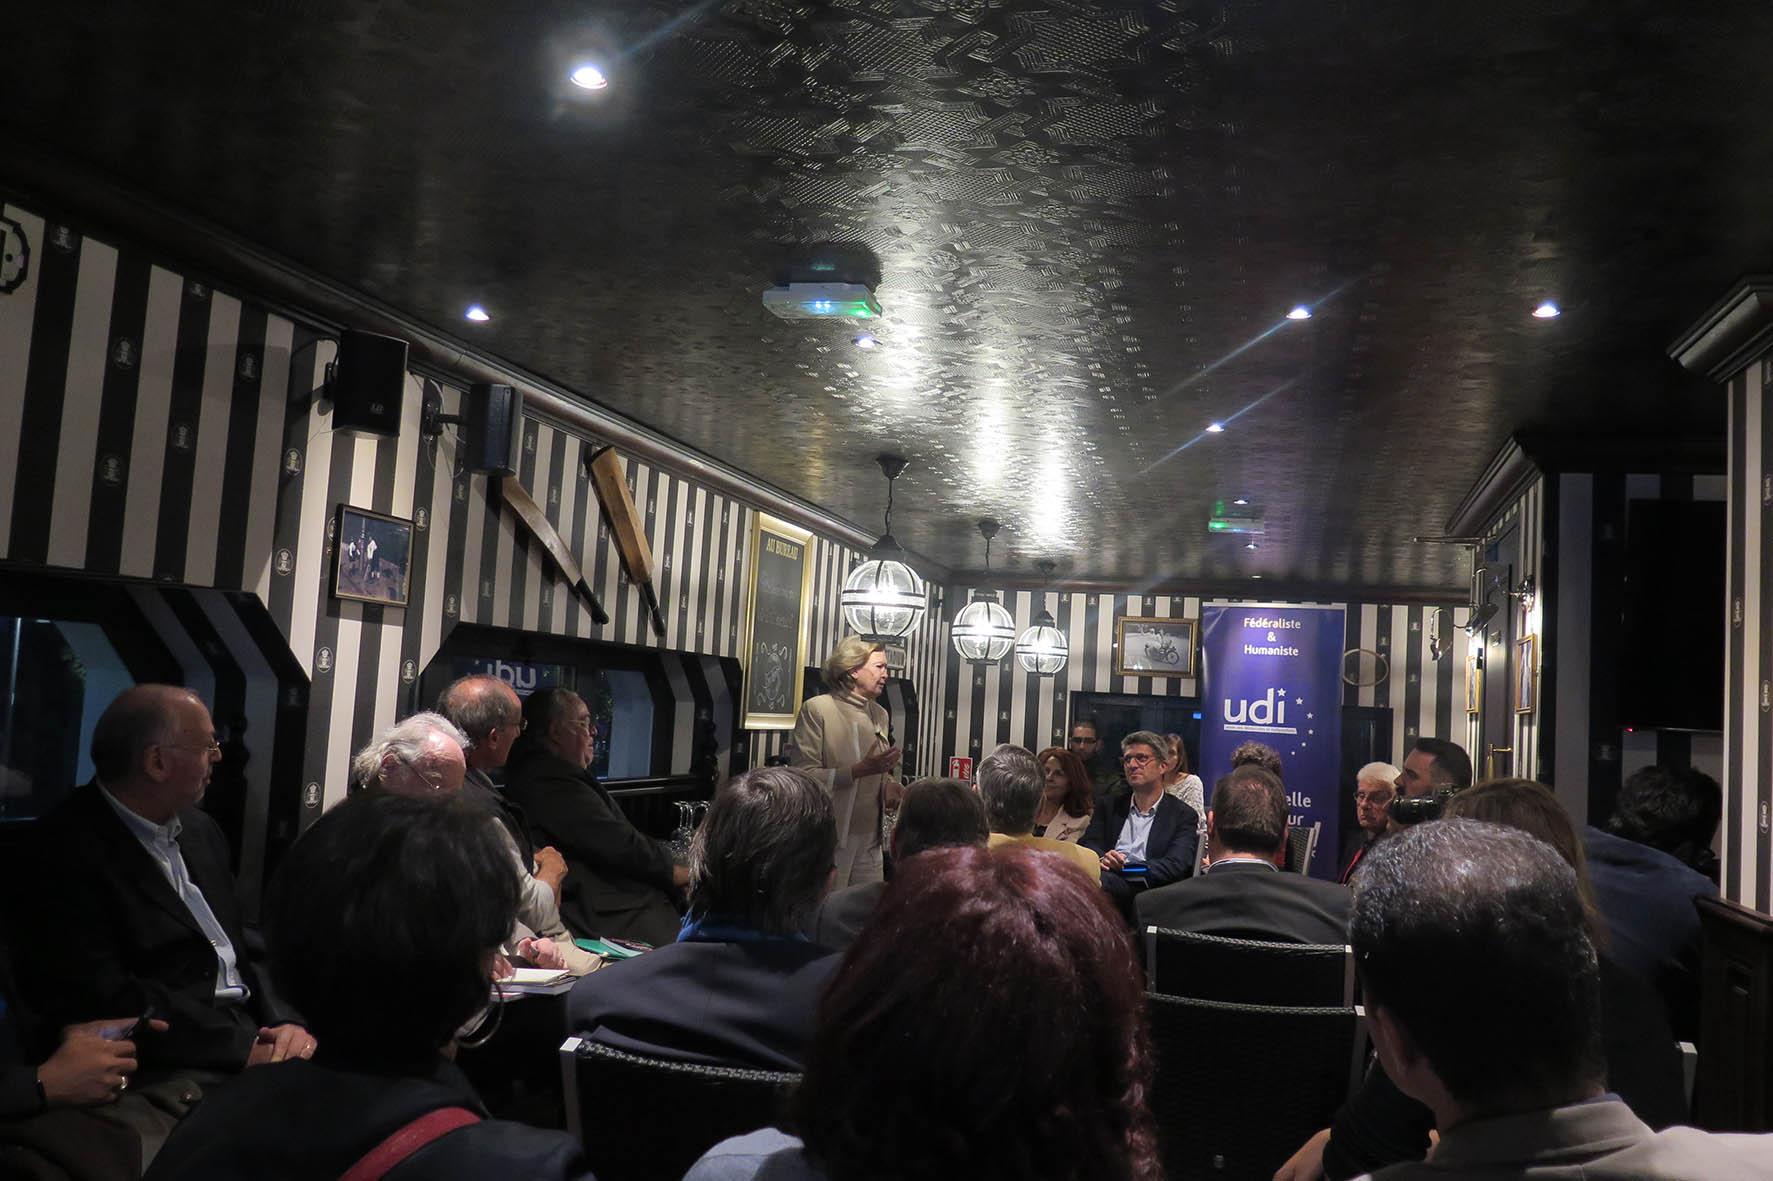 federation-udi-metropole-de-lyon-nicole-fontaine-conference-brexit-12